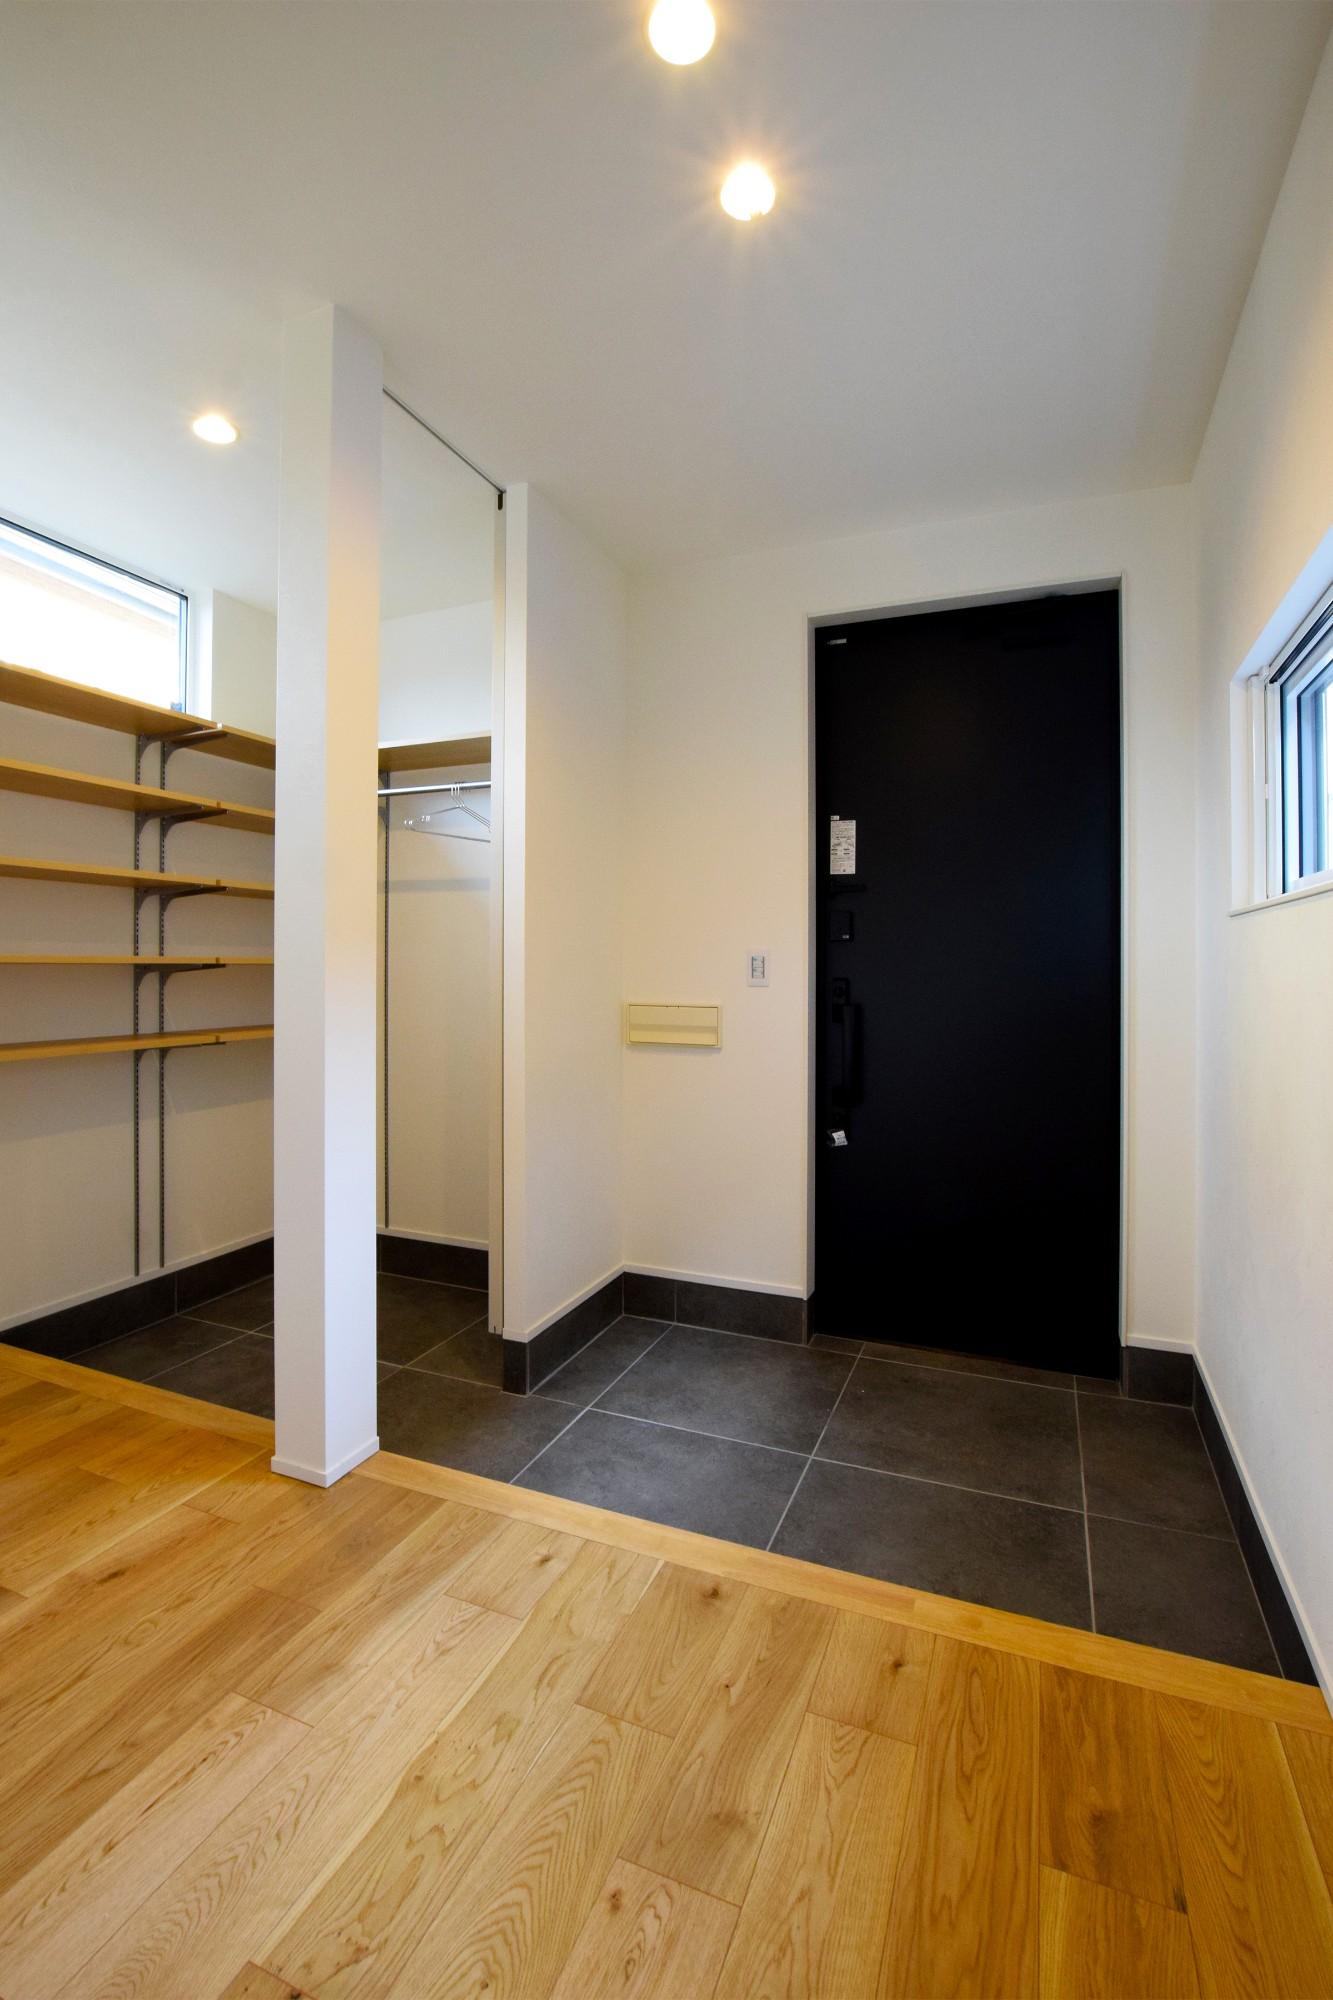 DETAIL HOME(ディテールホーム)「オークを基調としたナチュラルモダンな家」のシンプル・ナチュラルな玄関の実例写真